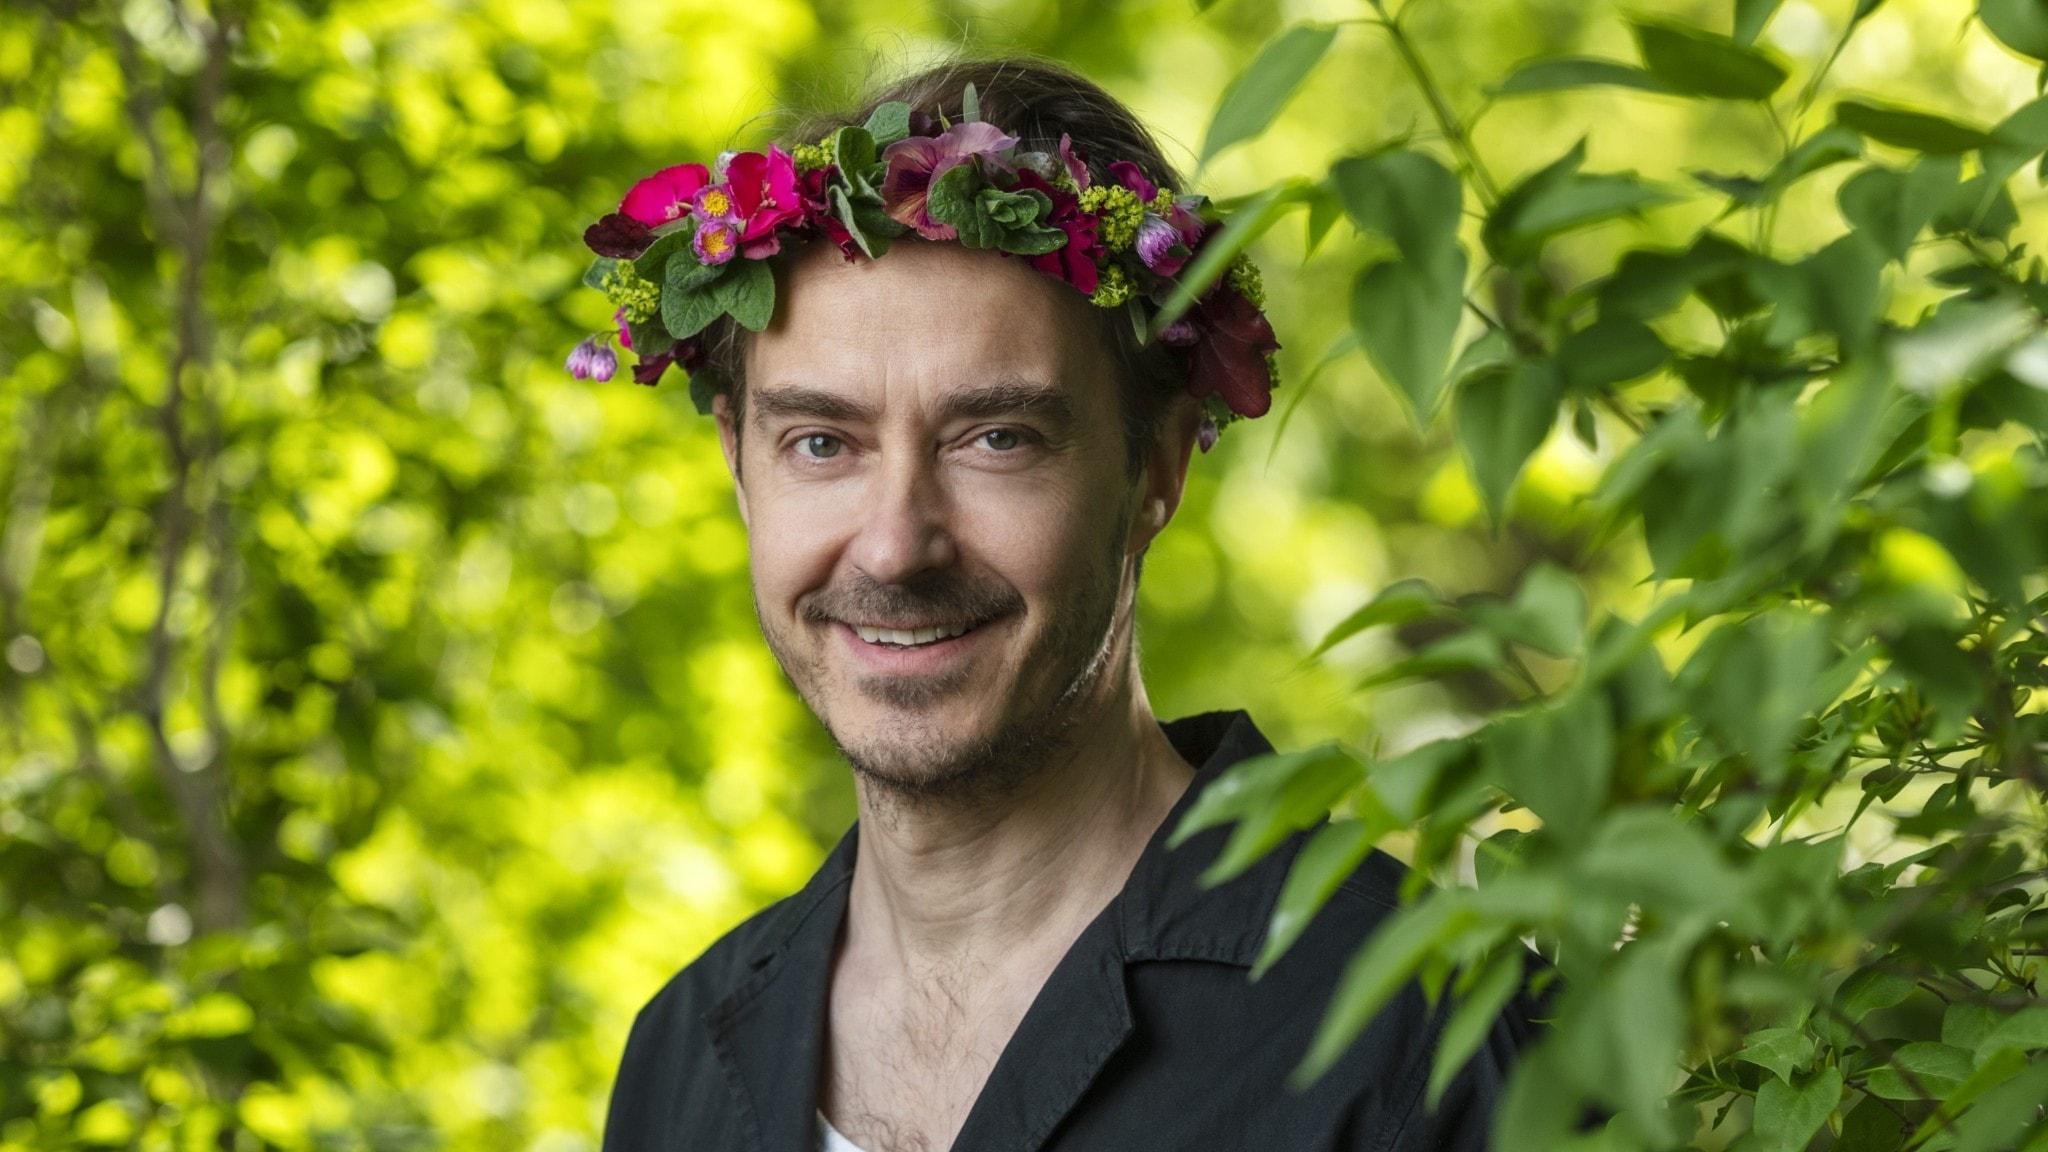 Jonas Karlsson i blomsterkrans.